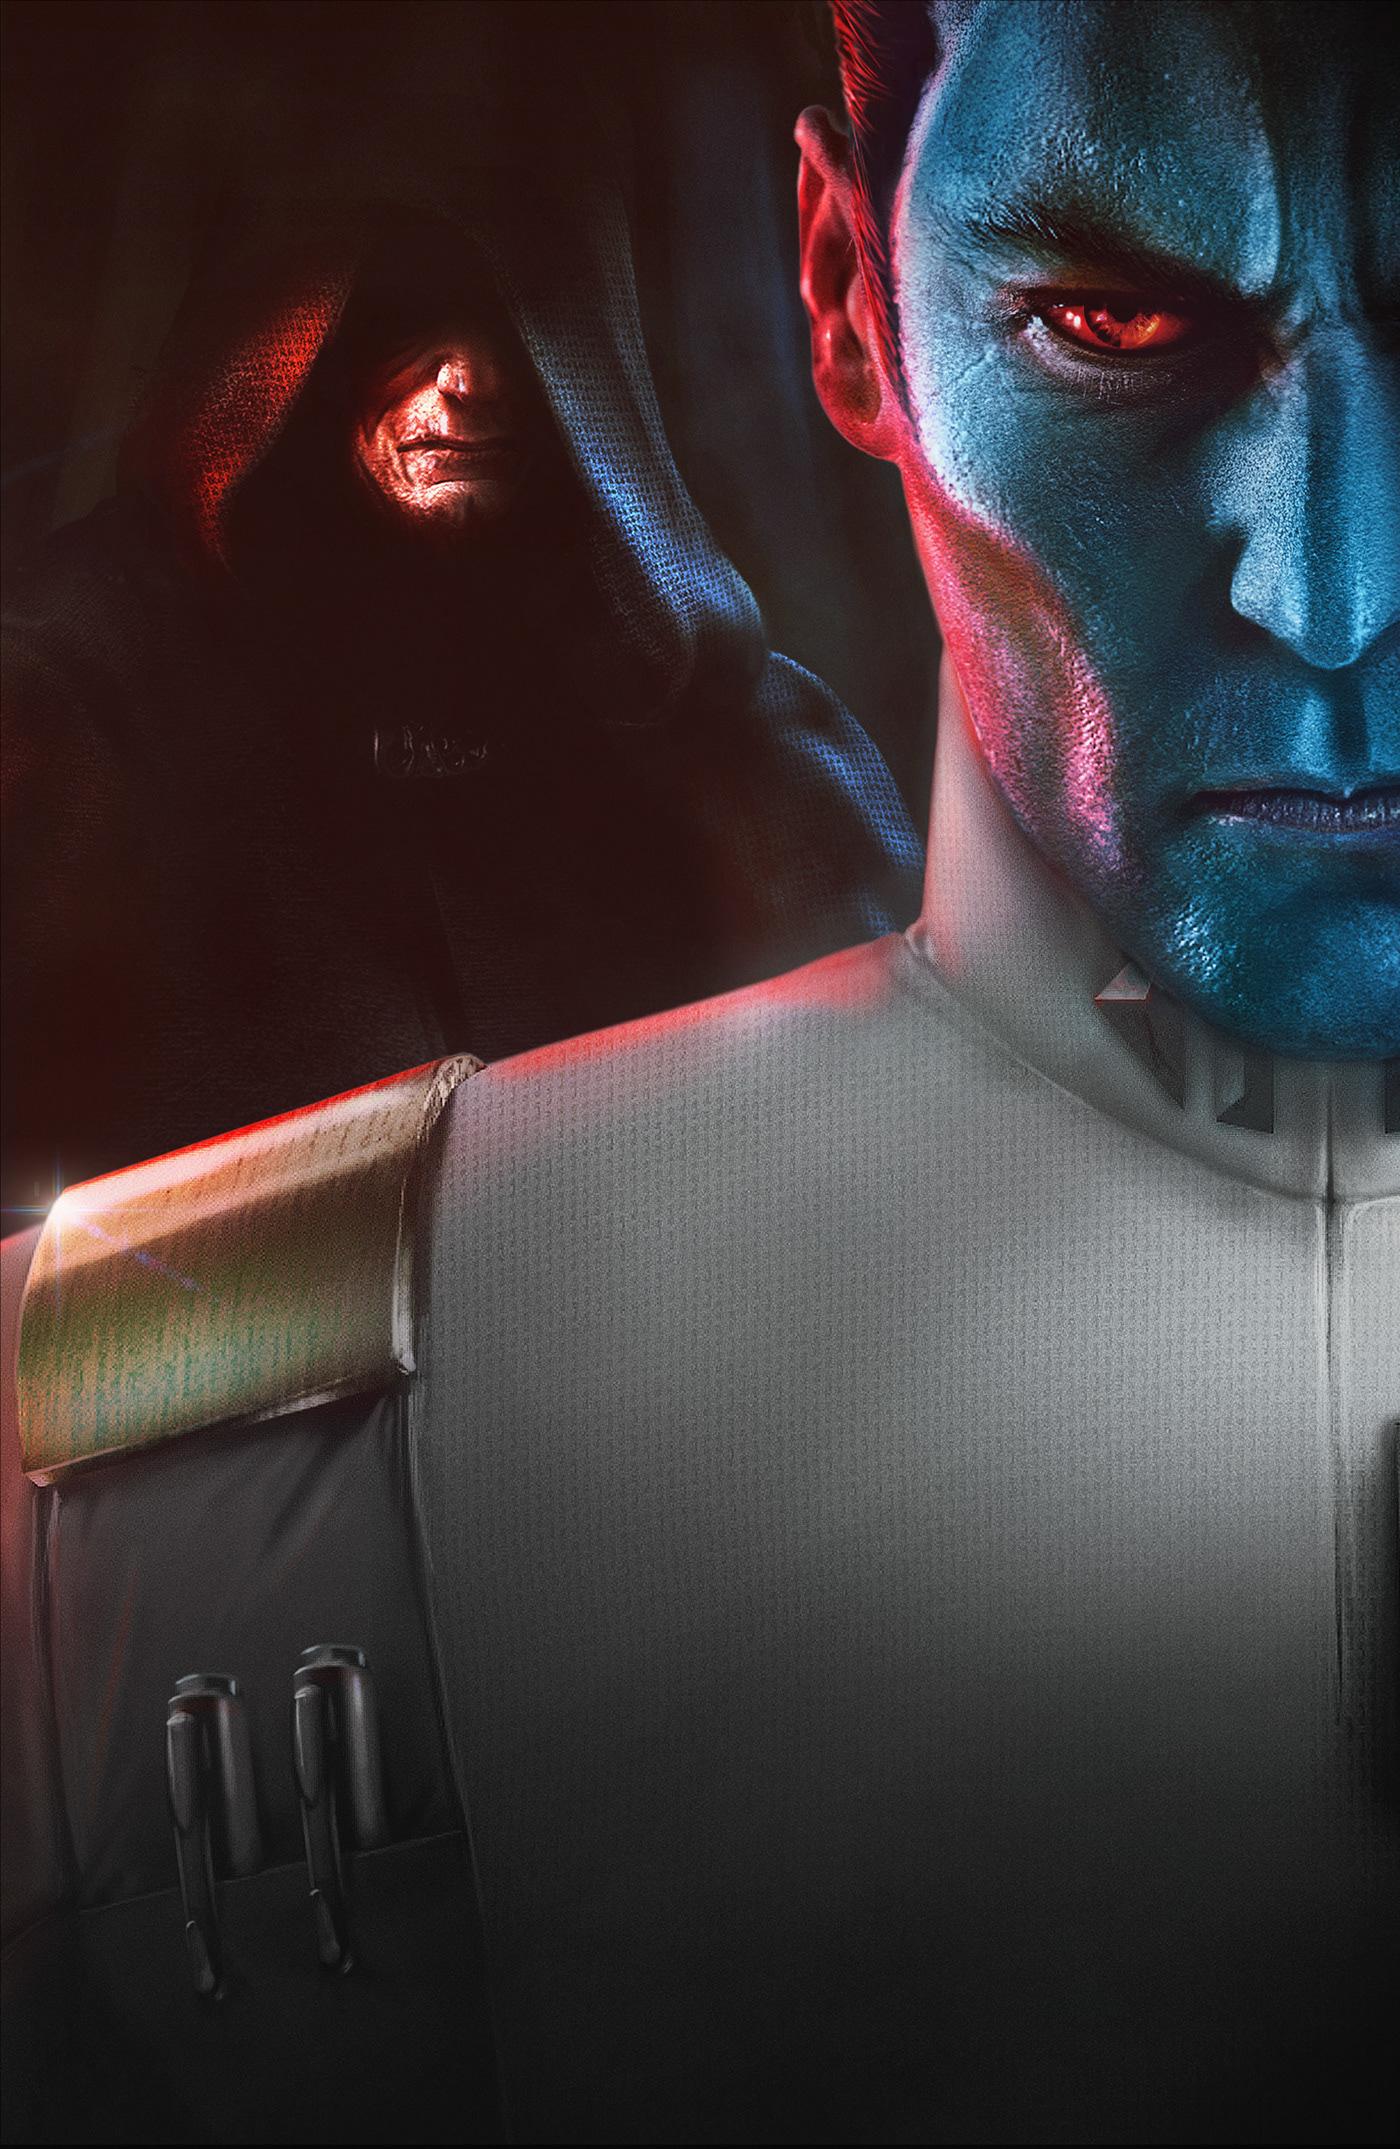 star wars palpatine emperor thrawn villain villains Dark side force book cover cover